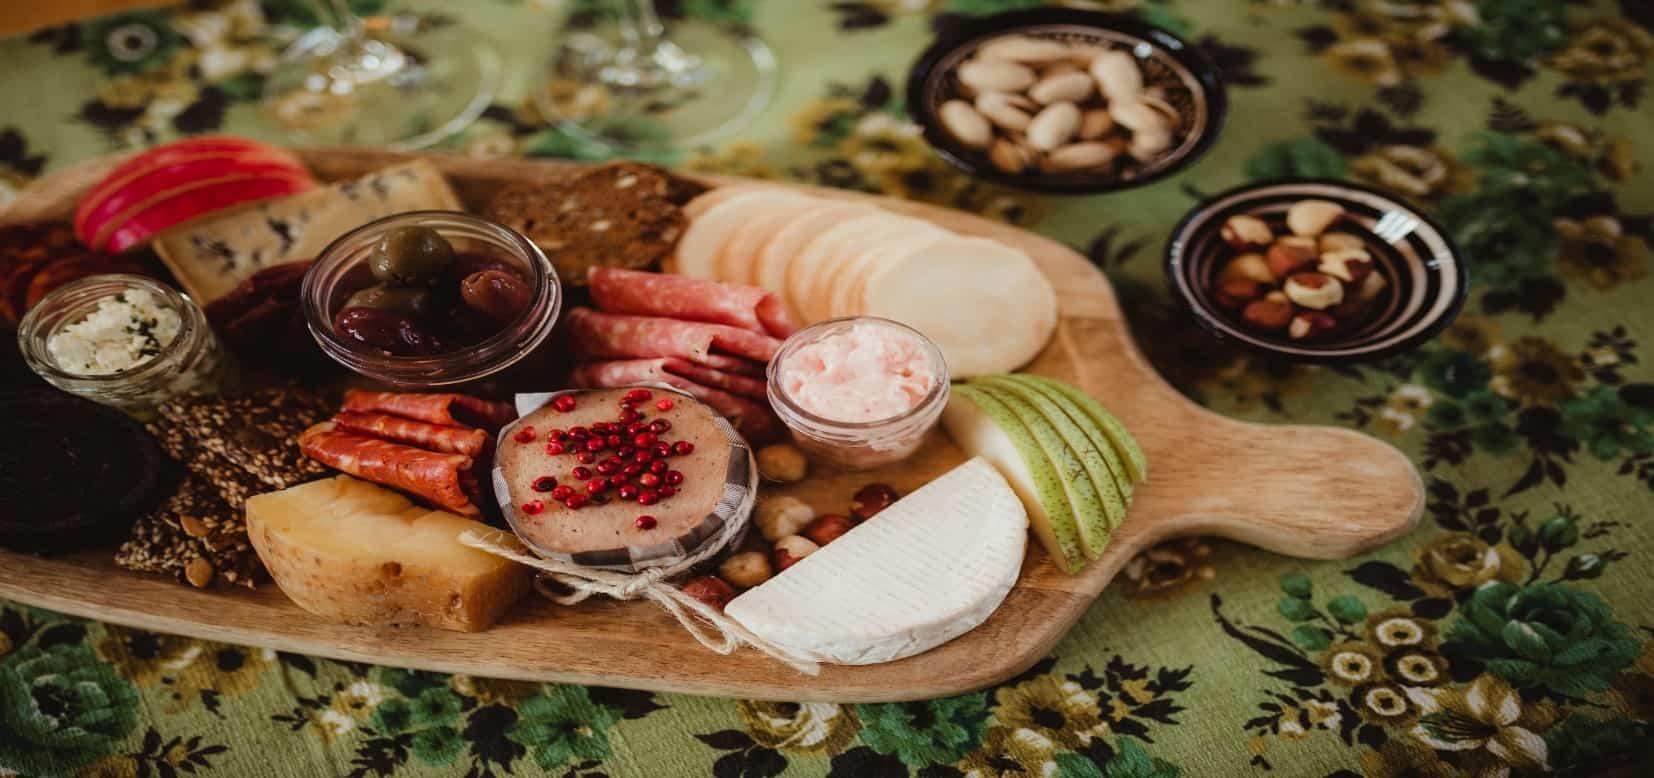 Luxury picnic table setting